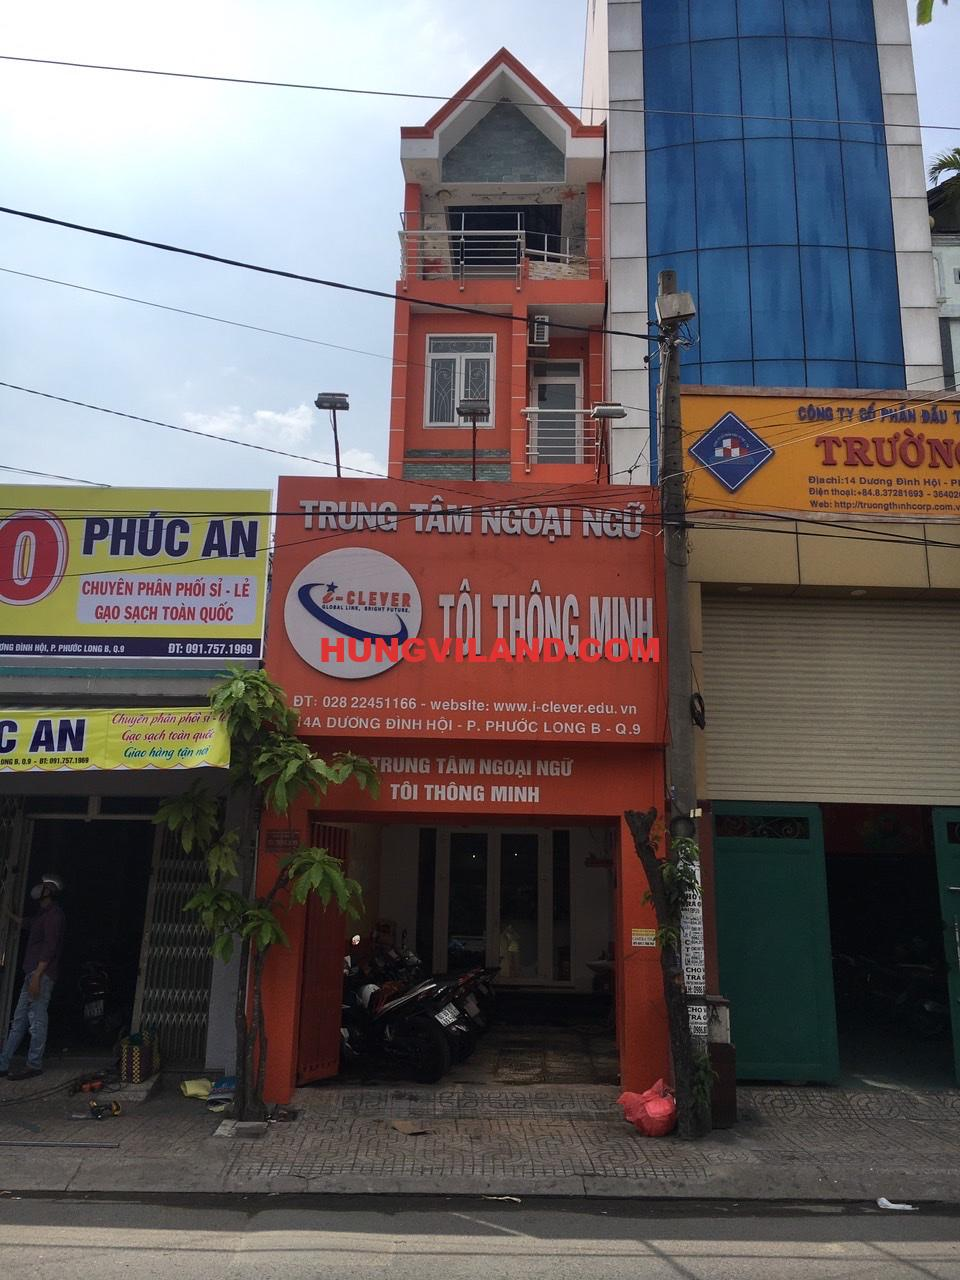 BAN NHA 4 TANG MT DUONG DINH HOI Q9